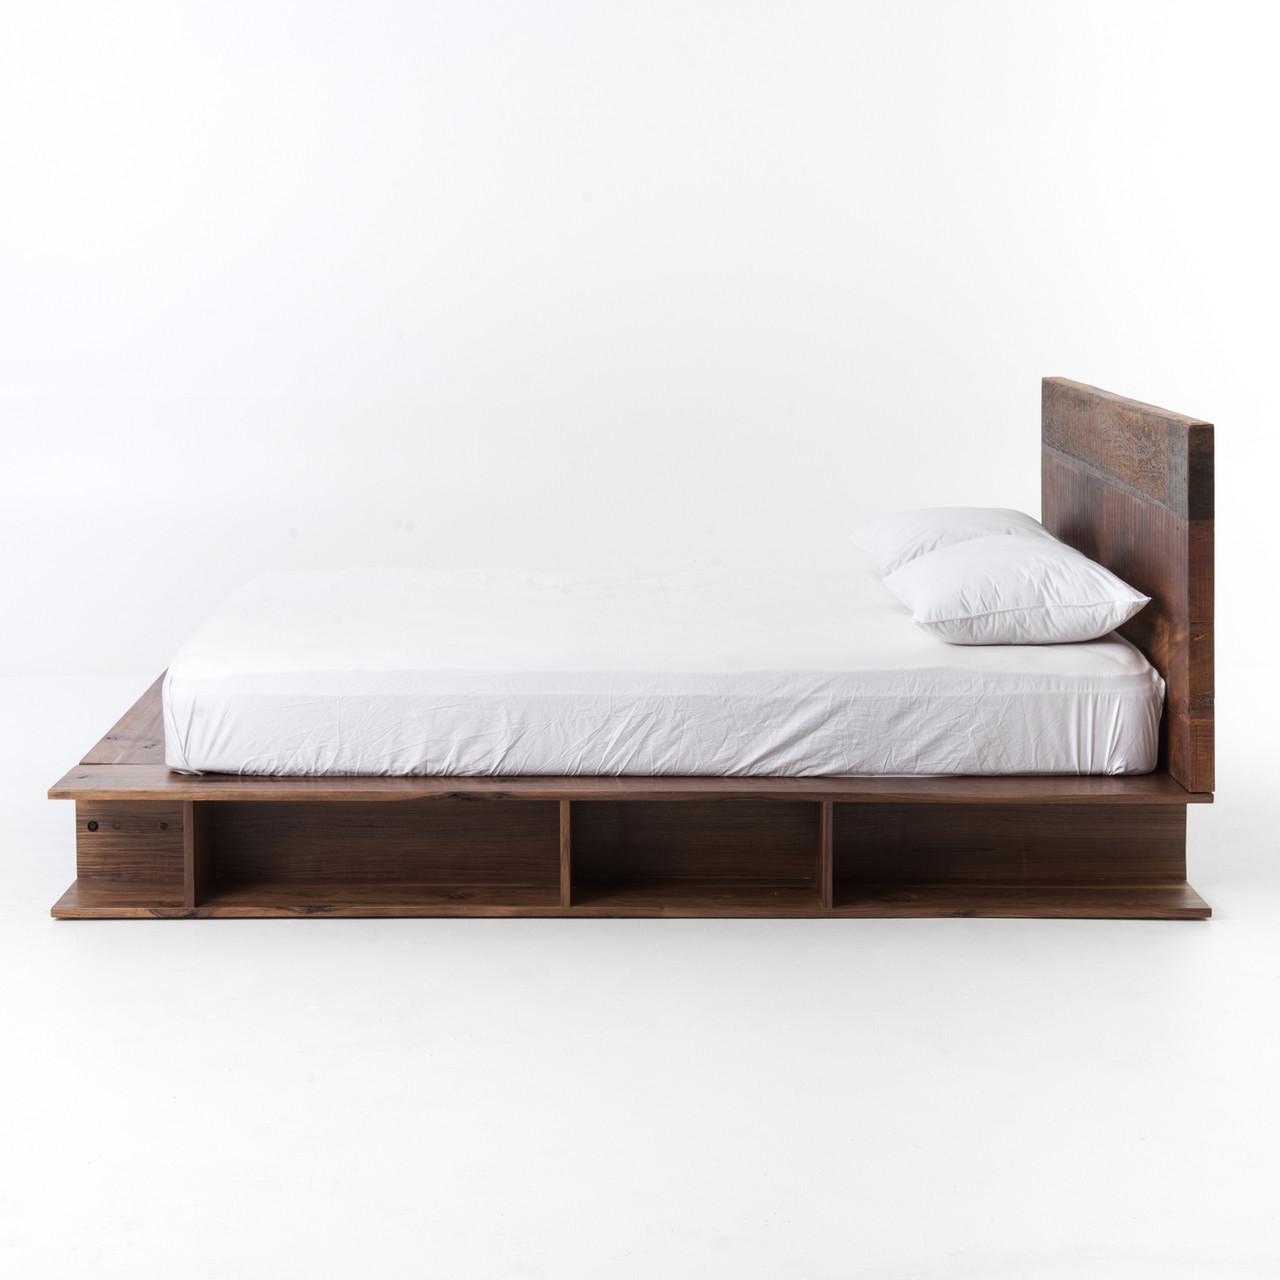 bonnie rustic reclaimed wood queen platform bed frame - Queen Platform Bed Frames